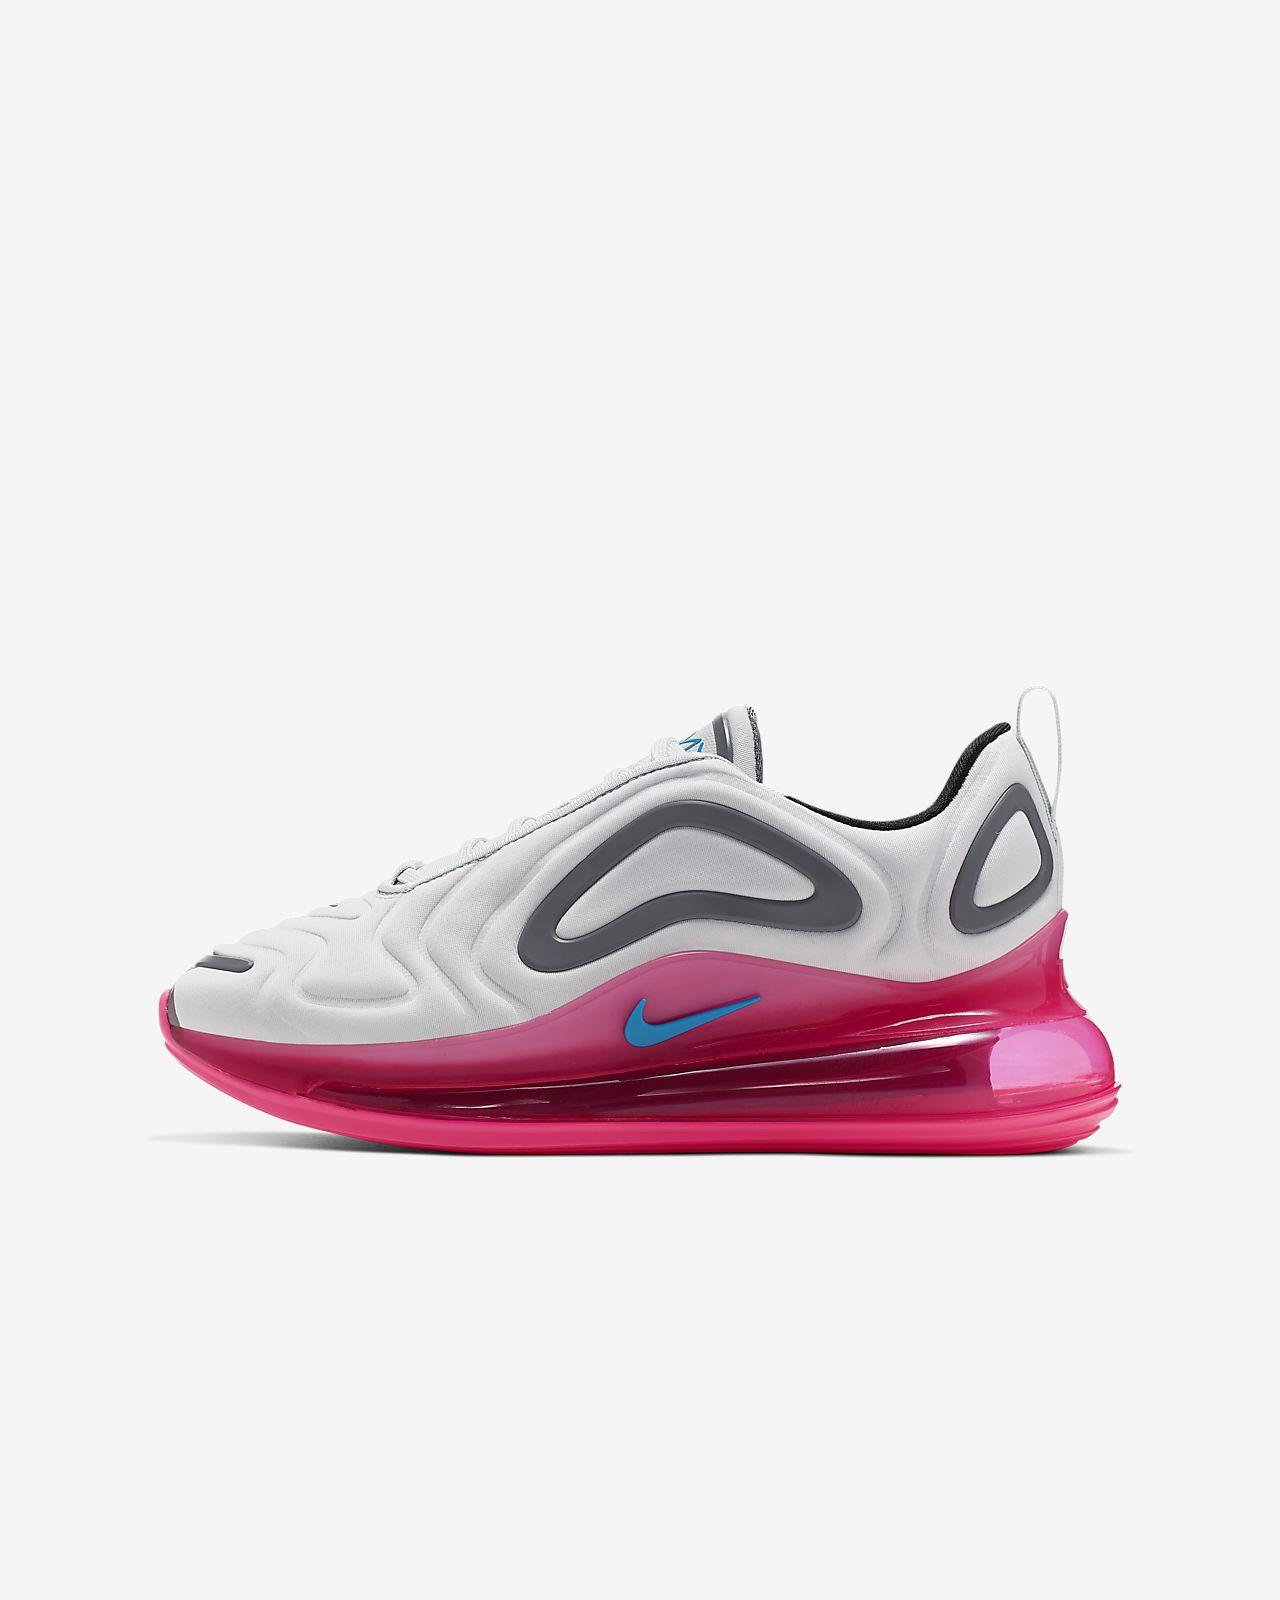 Sko Nike Air Max 720 för barn/ungdom